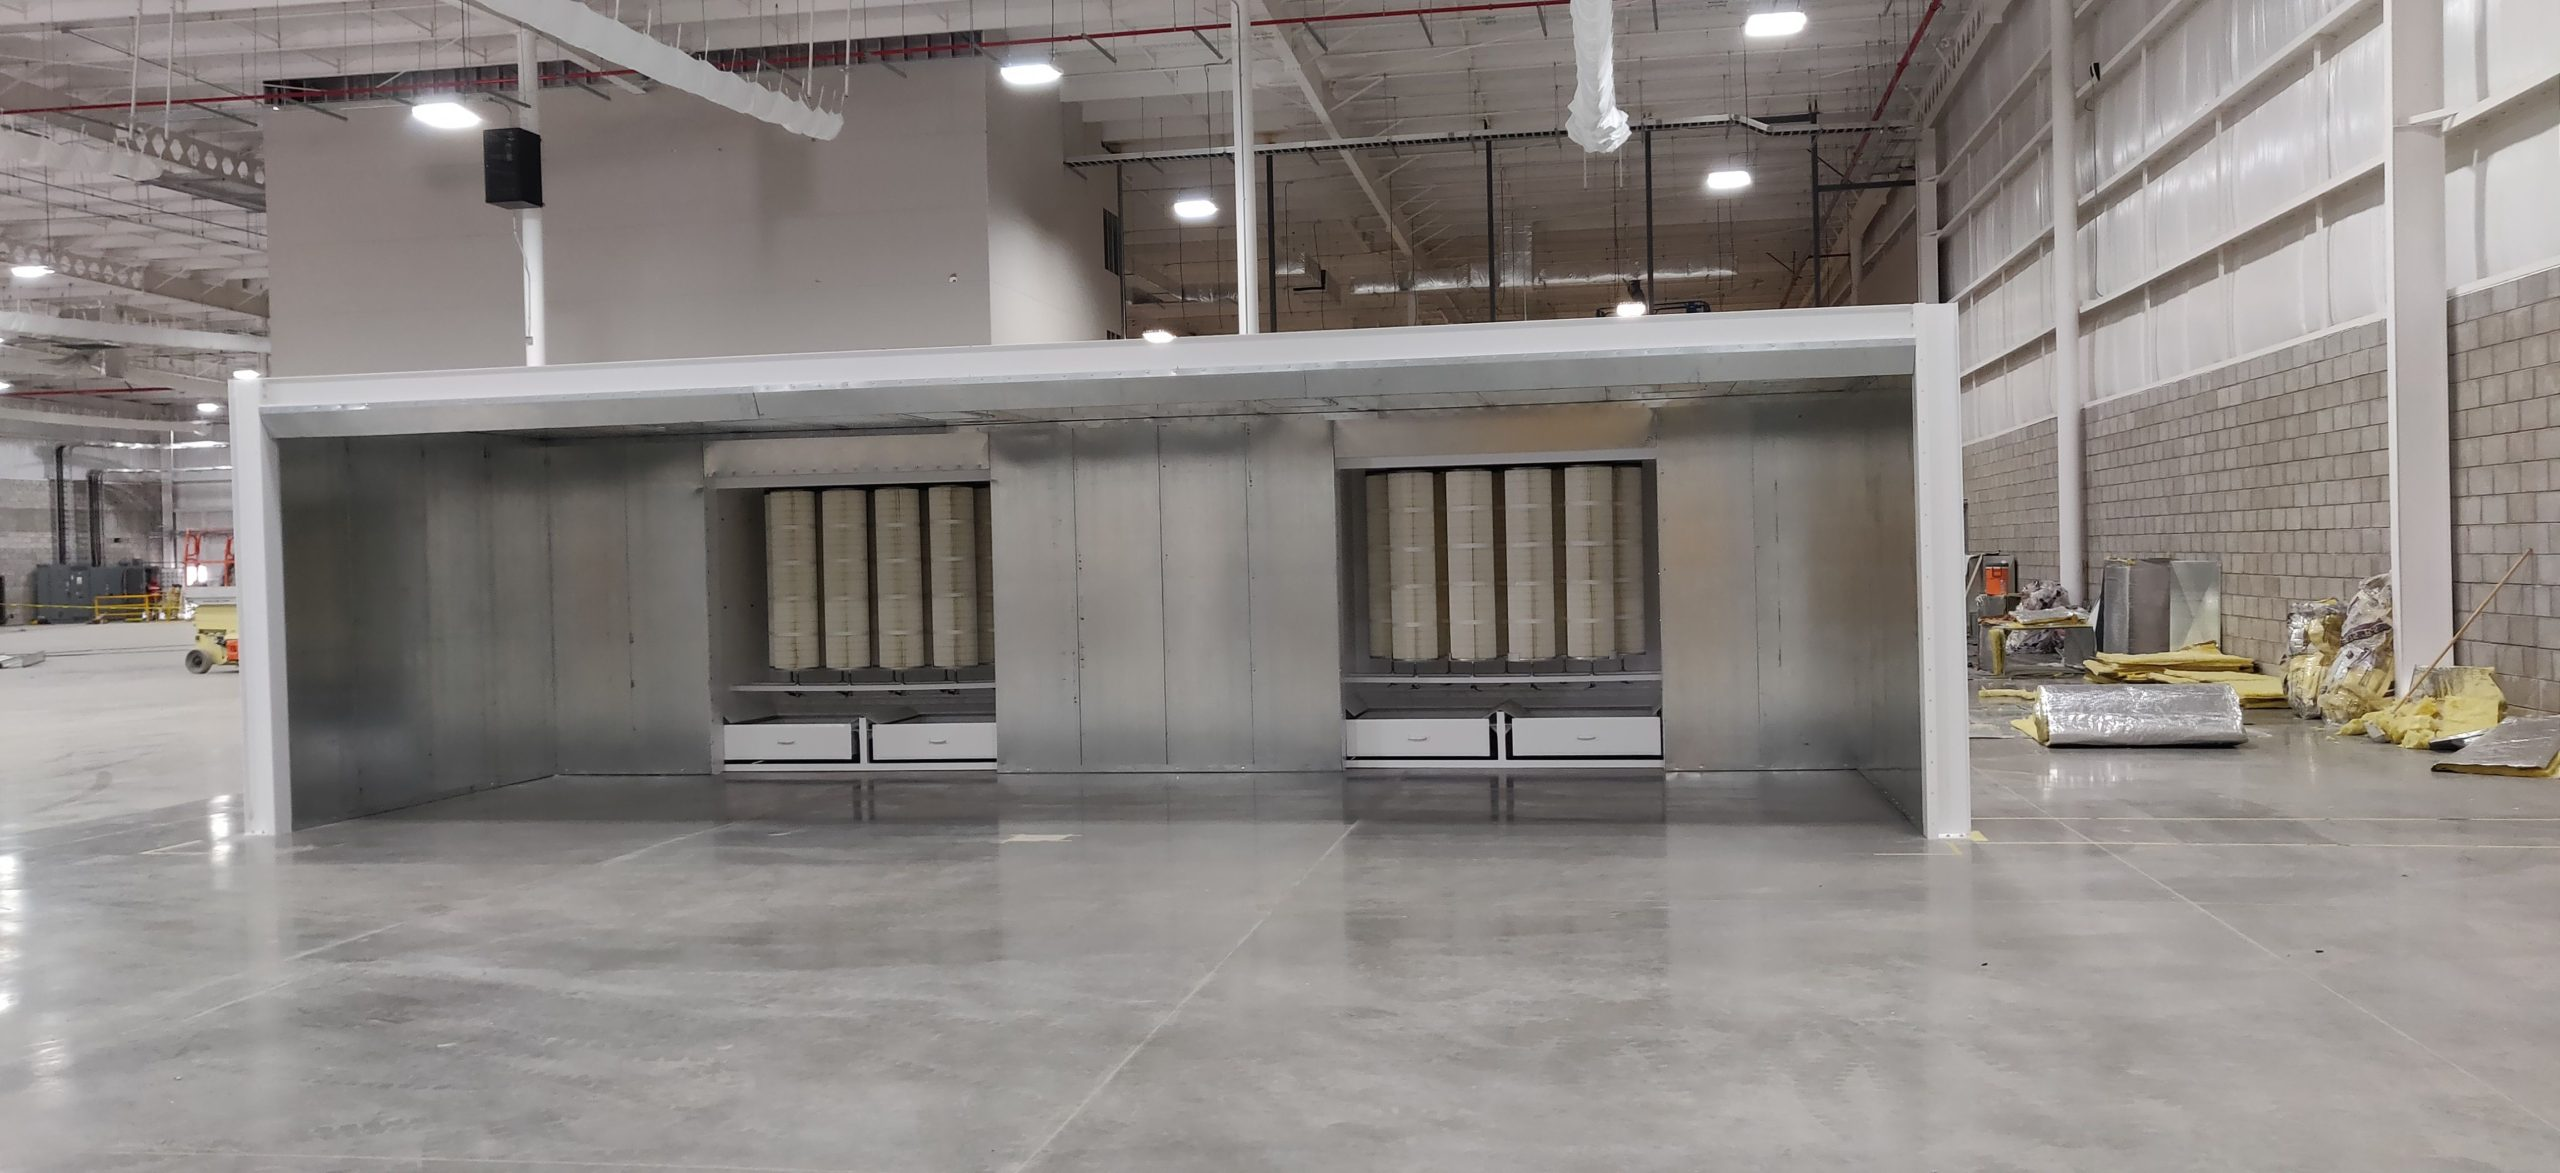 Cartridge Batch Powder Booths Industrial Finishing Systems